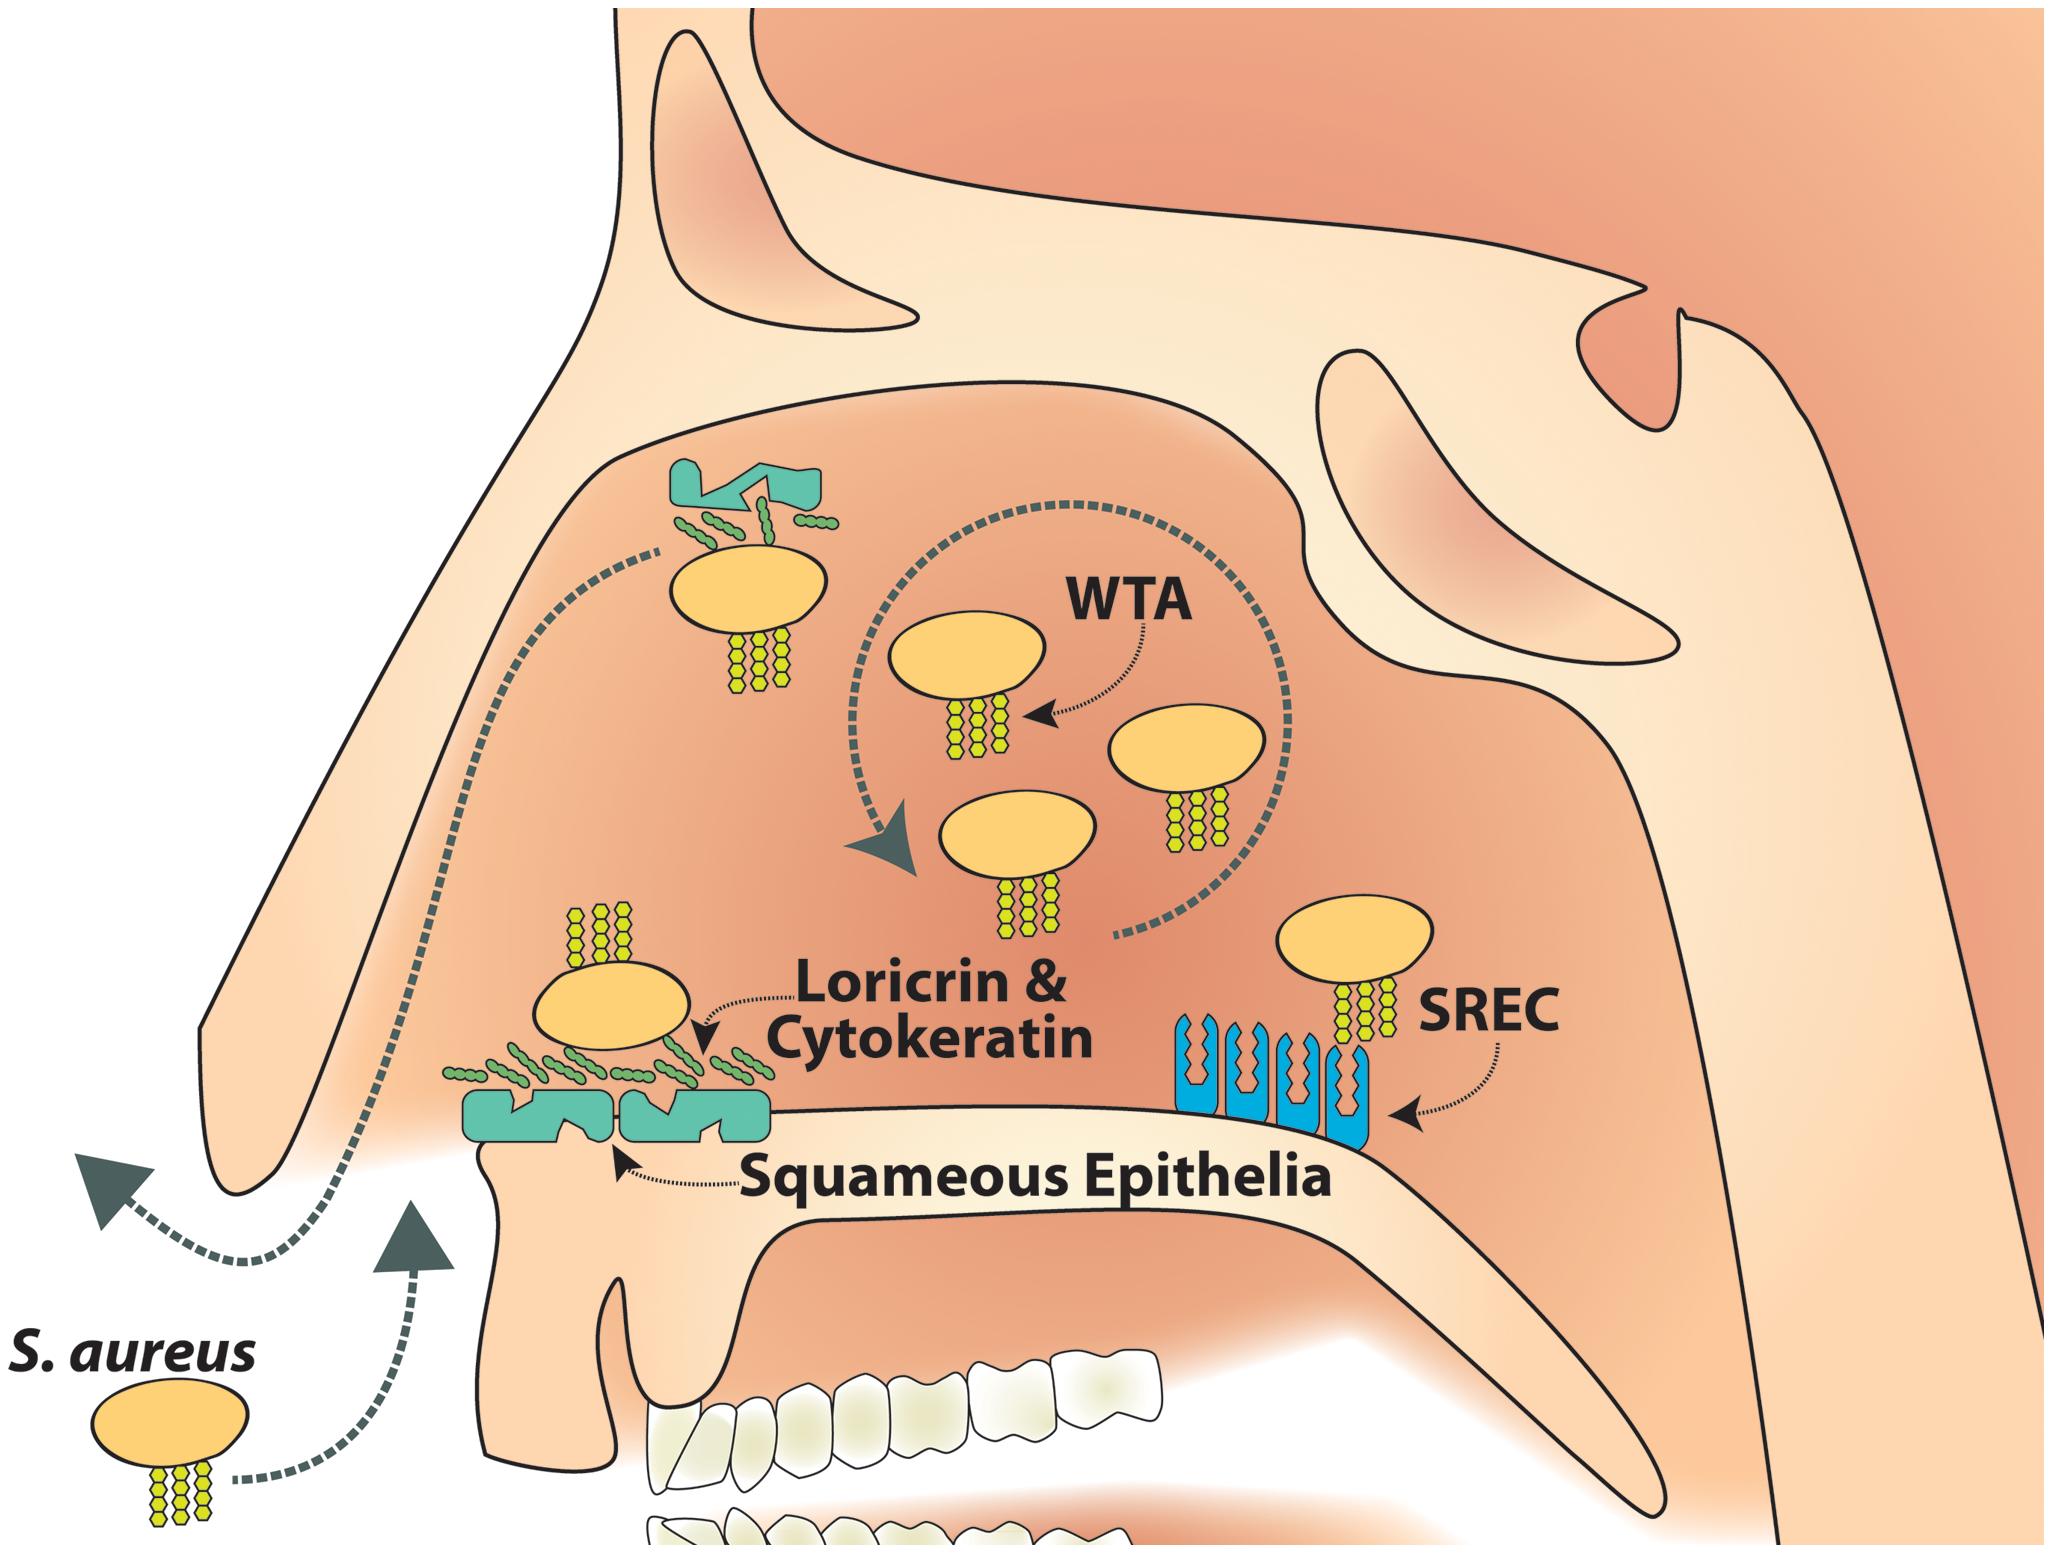 Model of SREC-I role in nasal colonization.